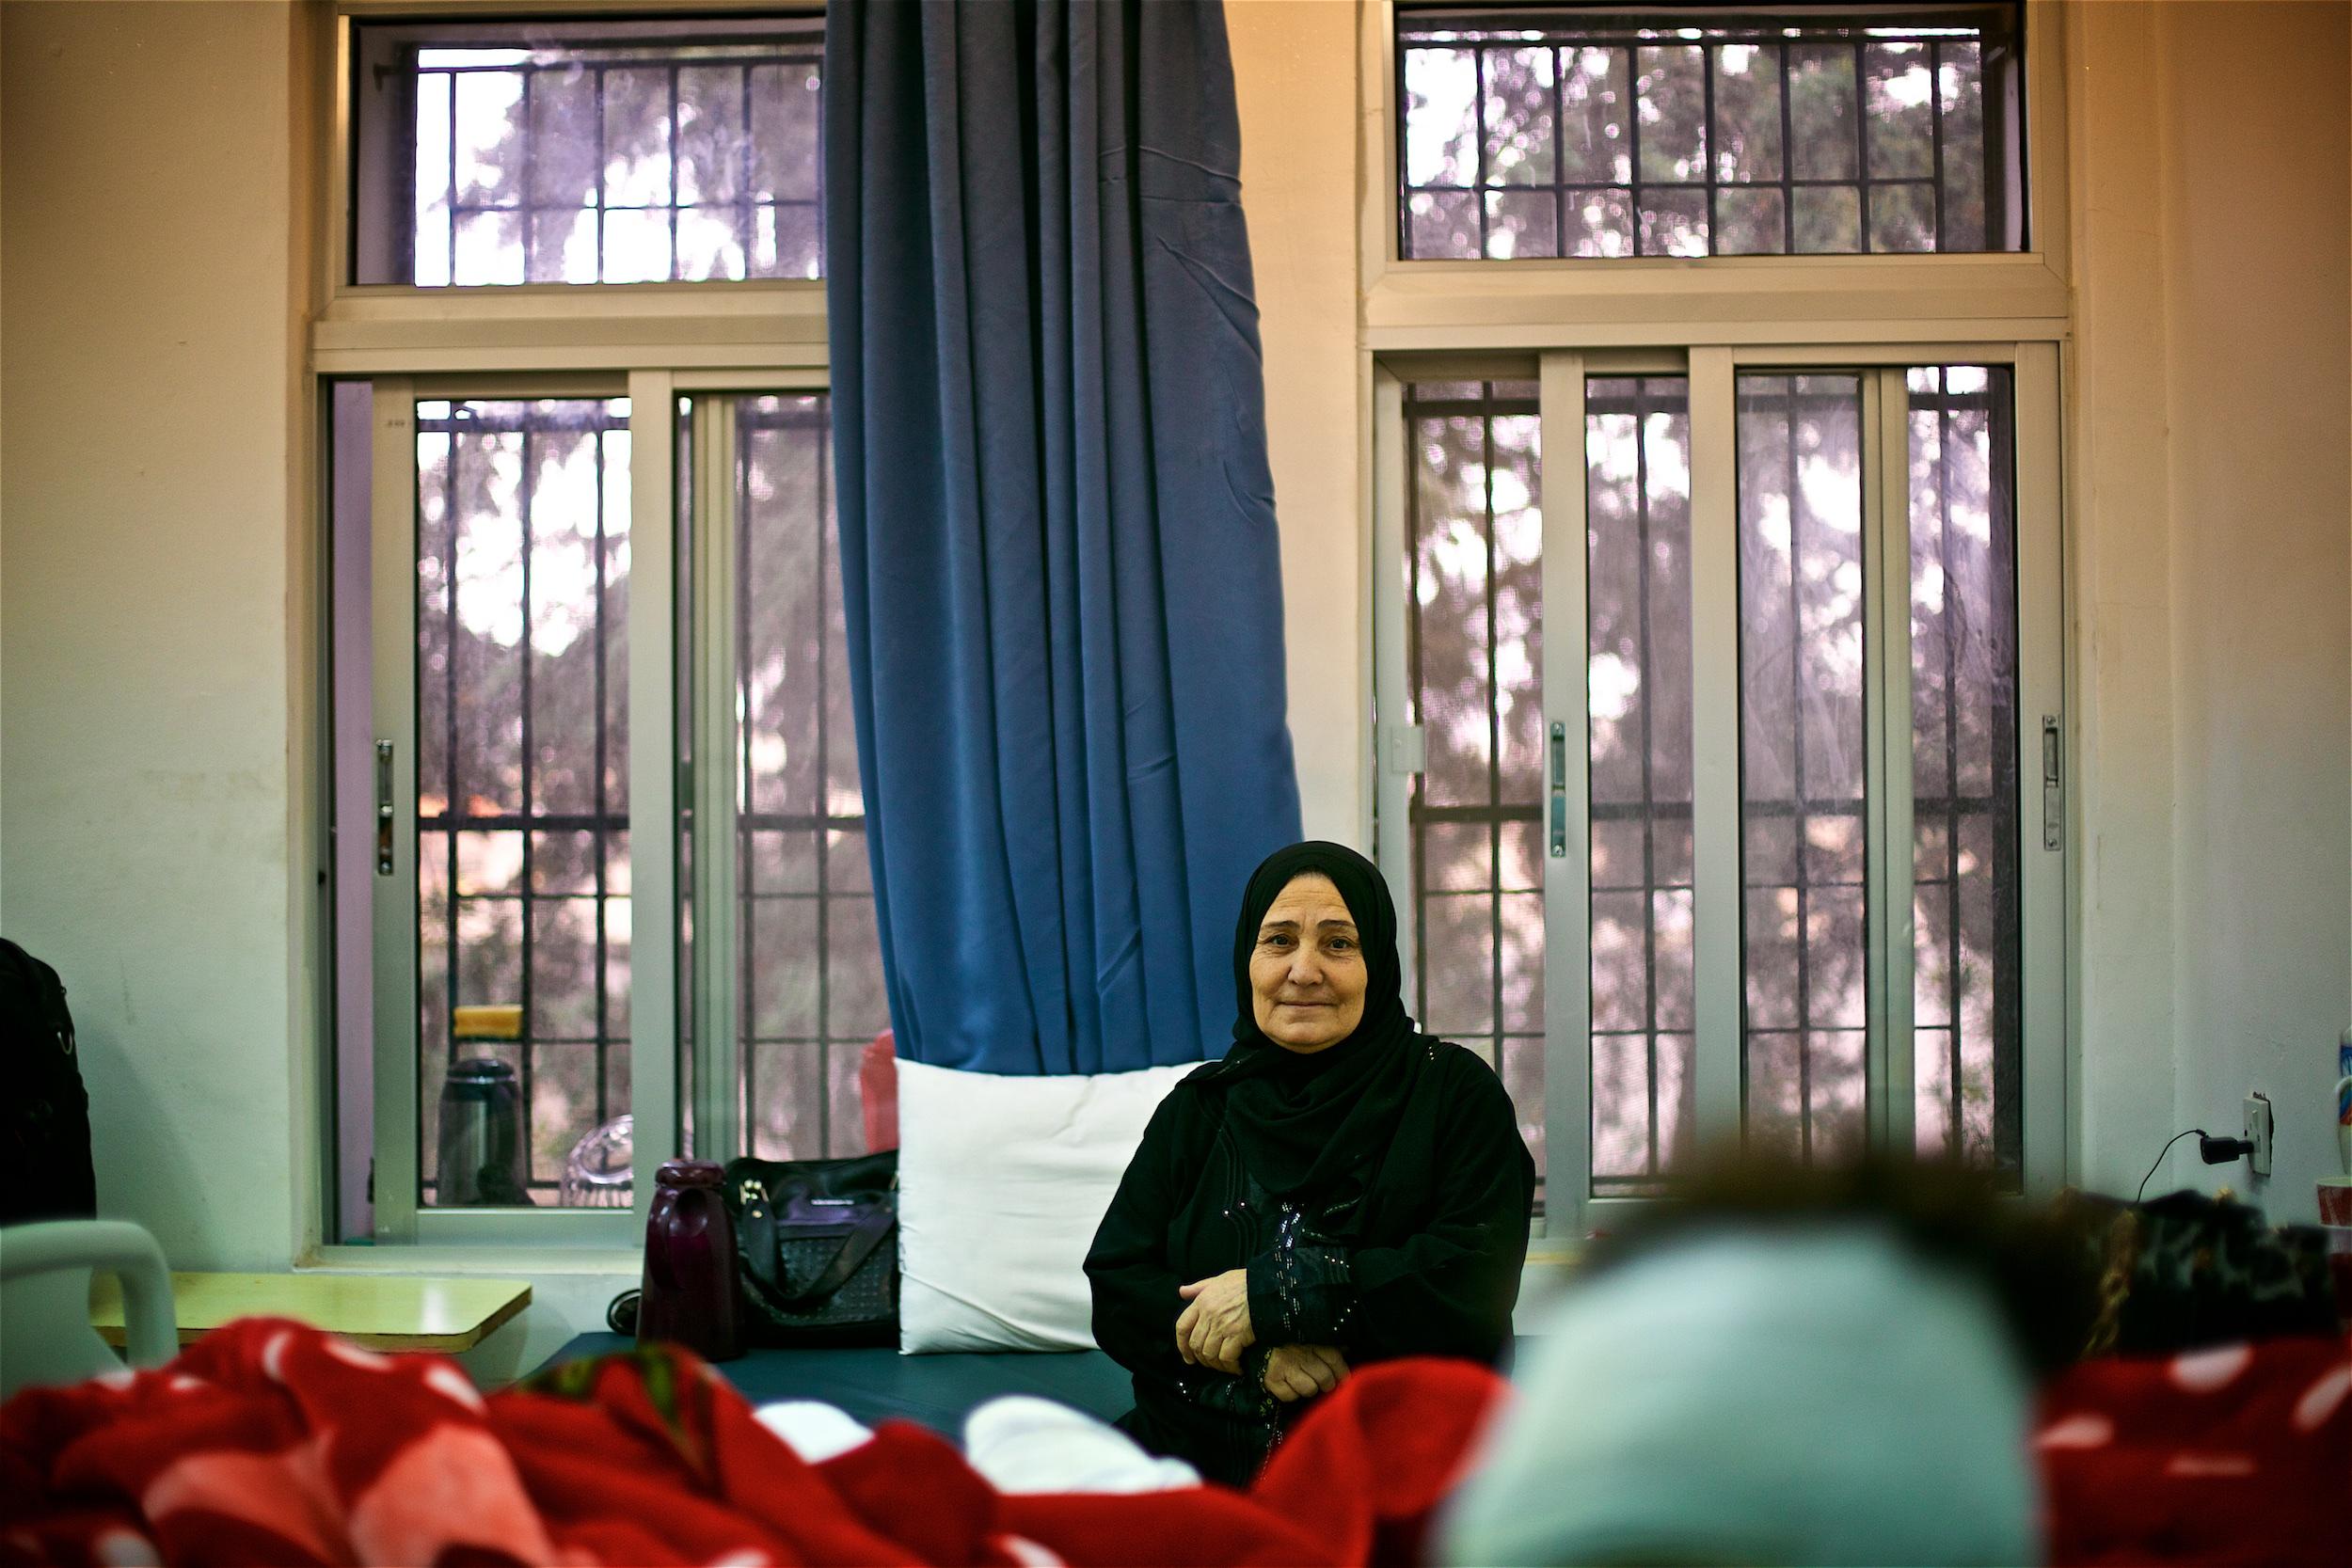 jordan-msf-al-ramtha-dectors-without-borders-war-hospital-refugee-camp-denis-bosnic-34.jpg